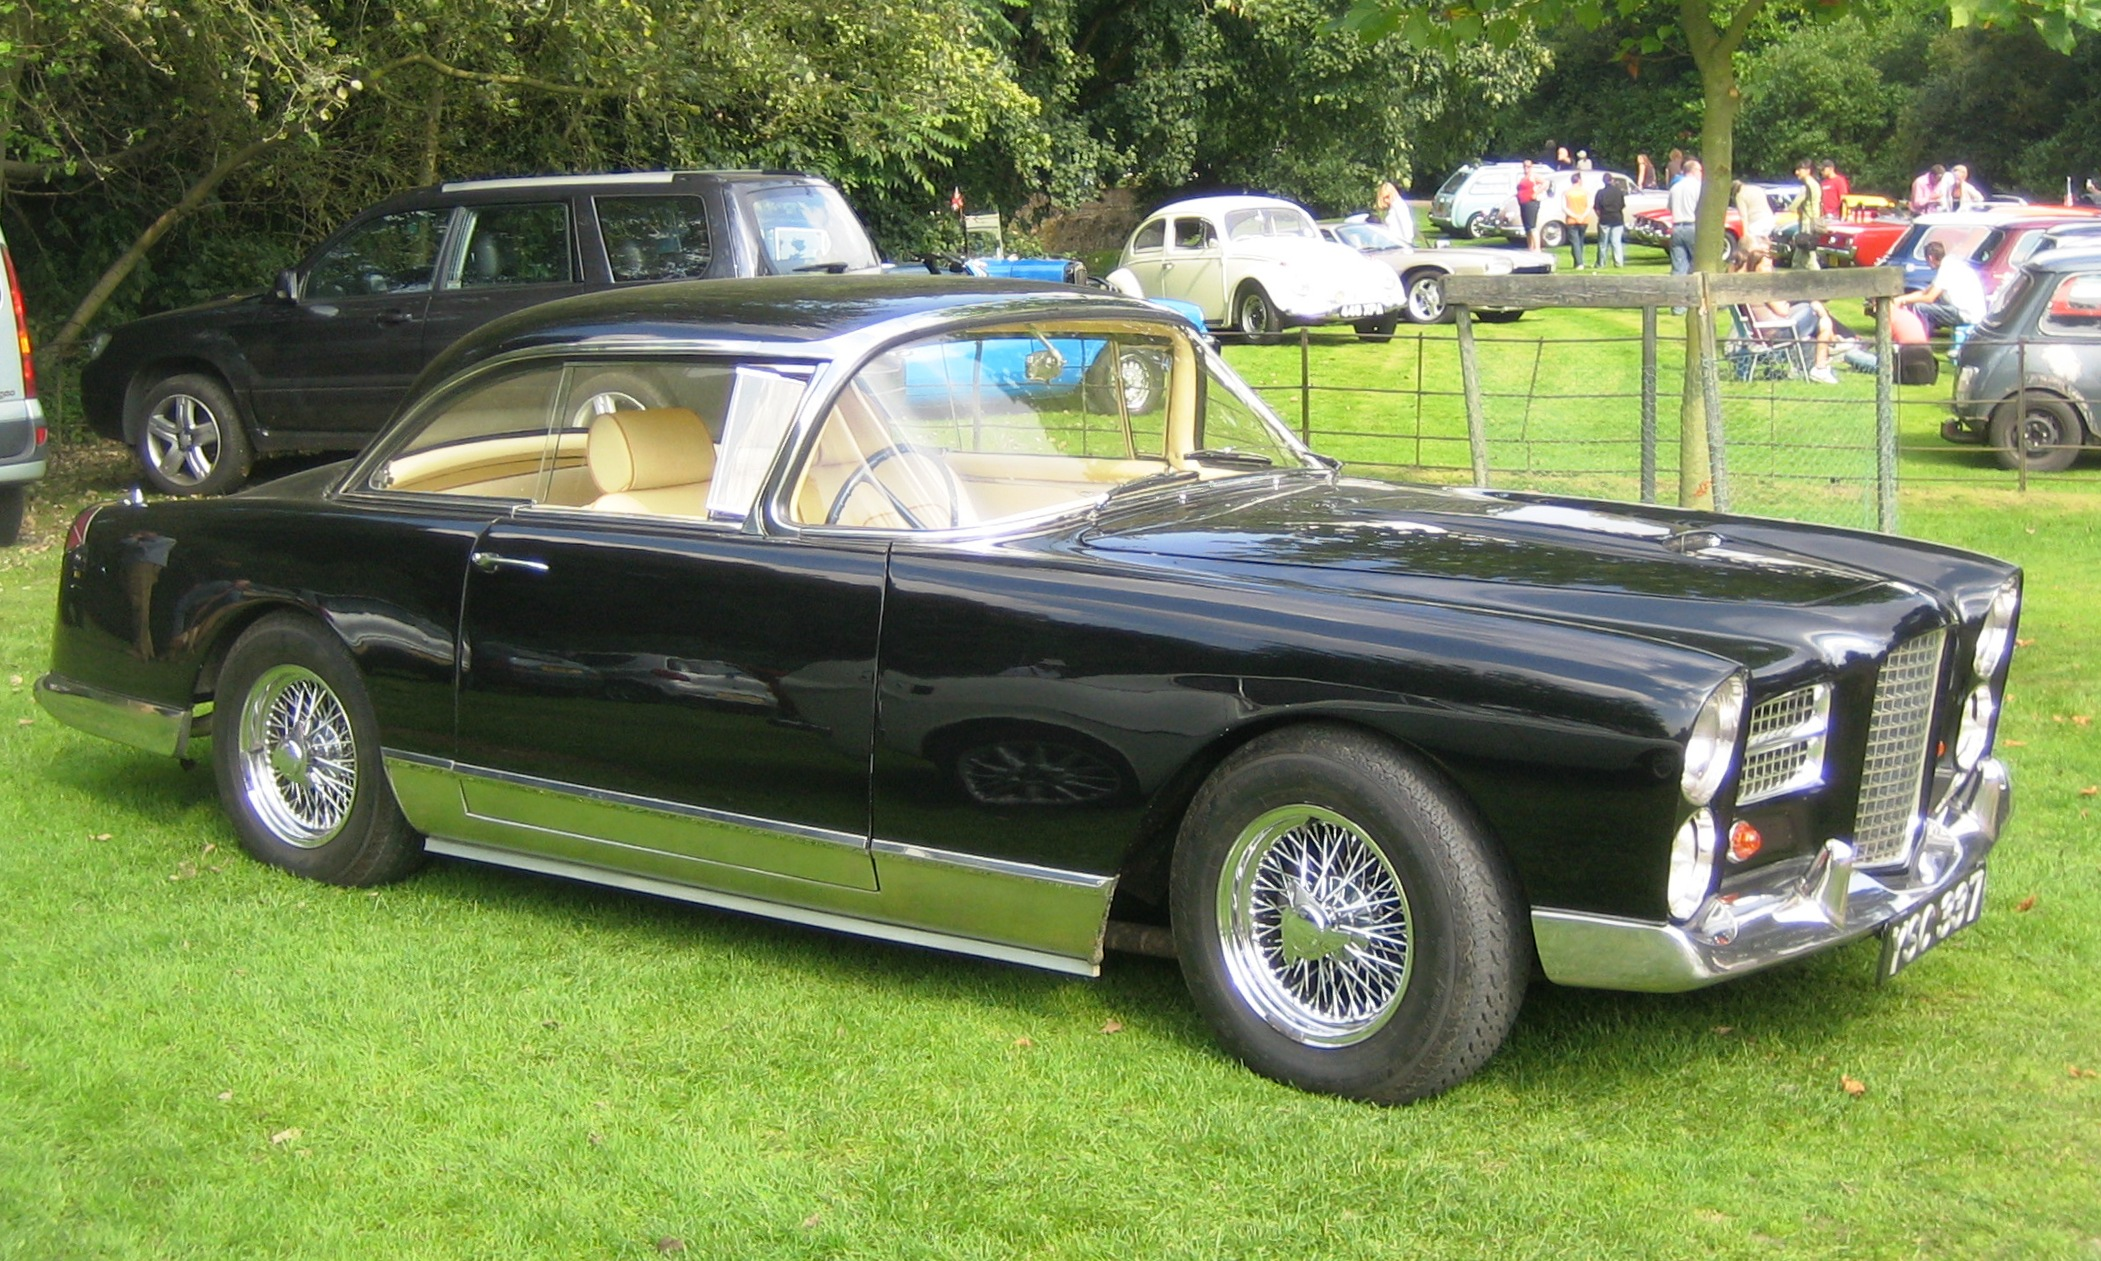 Racing Mower For Sale >> File:Facel Vega 1961 Castle Hedingham 2008.JPG - Wikipedia